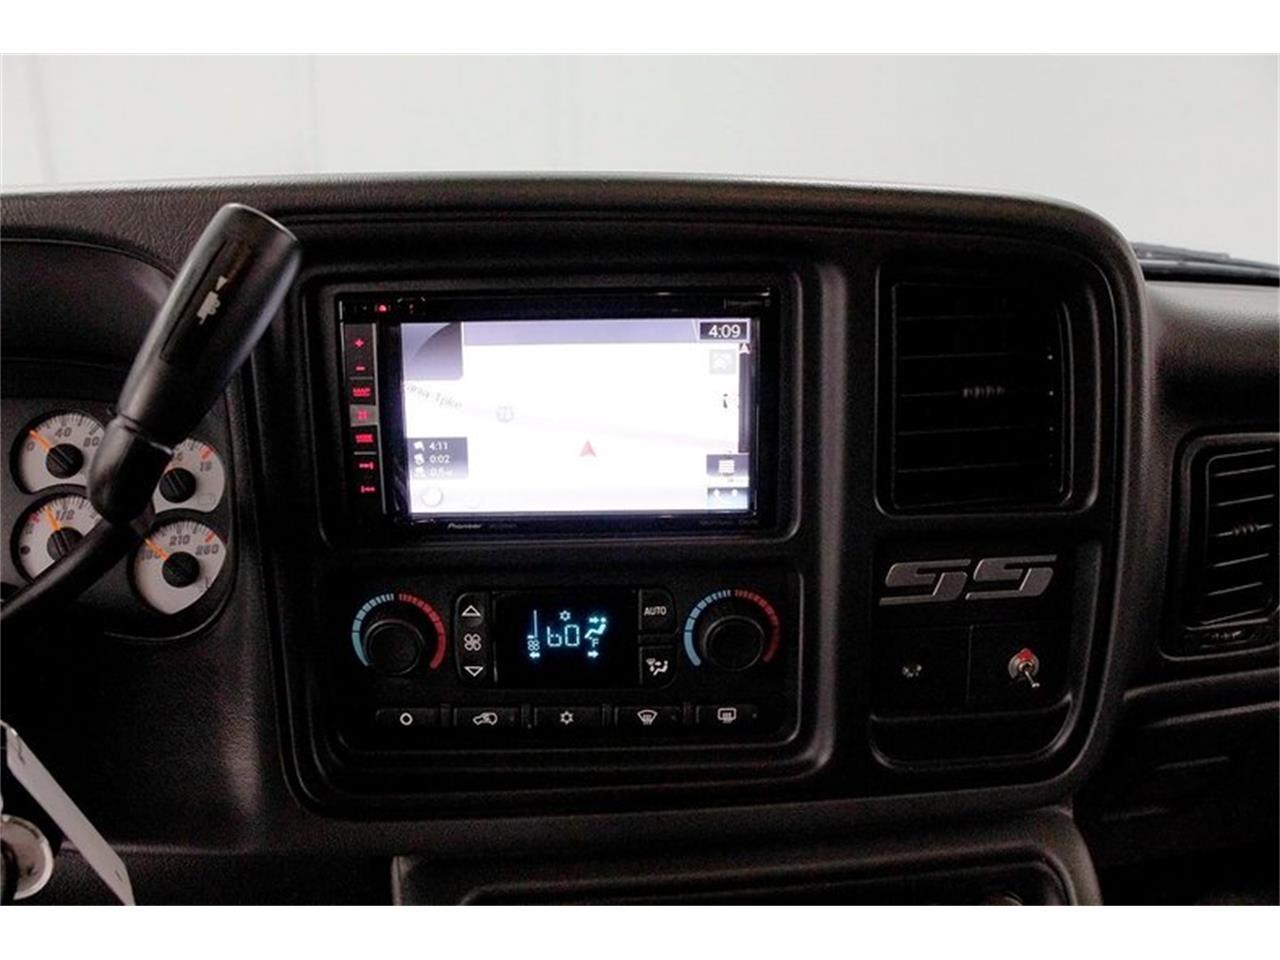 2006 Chevrolet Silverado (CC-1249392) for sale in Morgantown, Pennsylvania